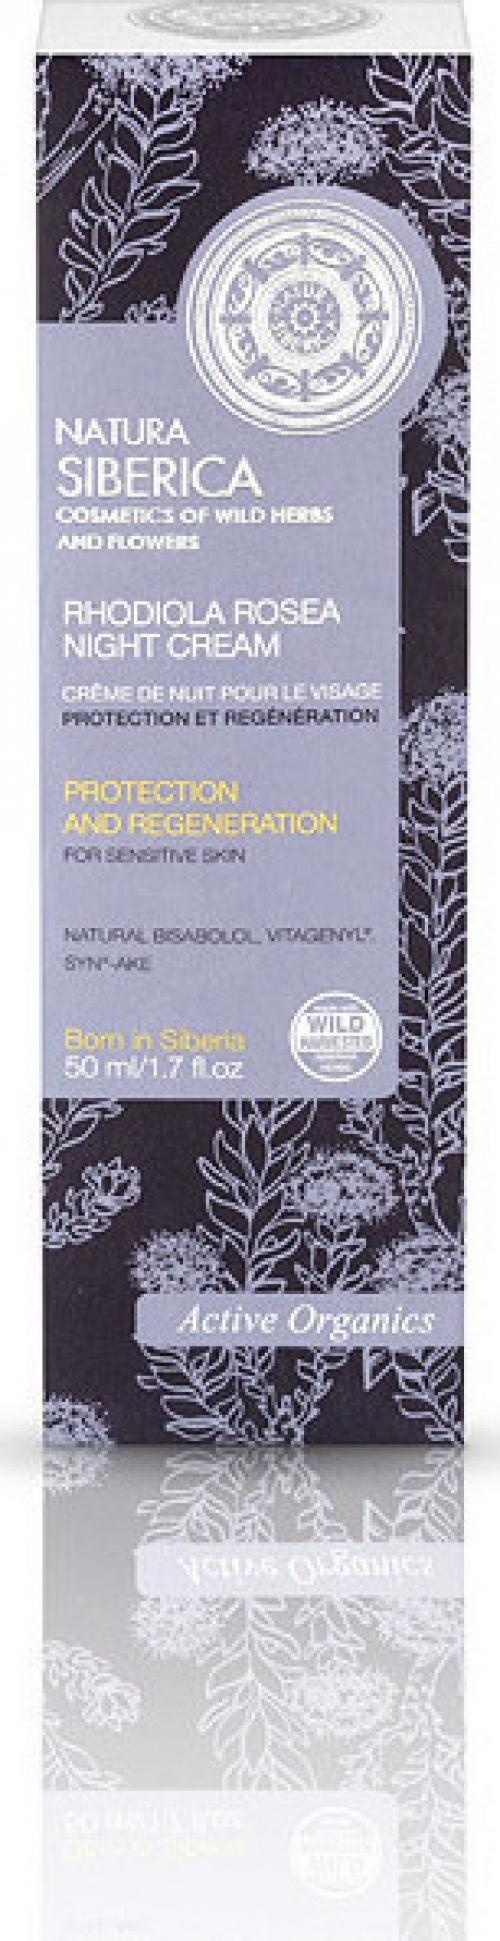 Rhodiola Rosea Night Cream, Προστασία και Ανάπλαση, Ευαίσθητο Δέρμα 50 ml (Κατάλληλο για ηλικίες 22+)